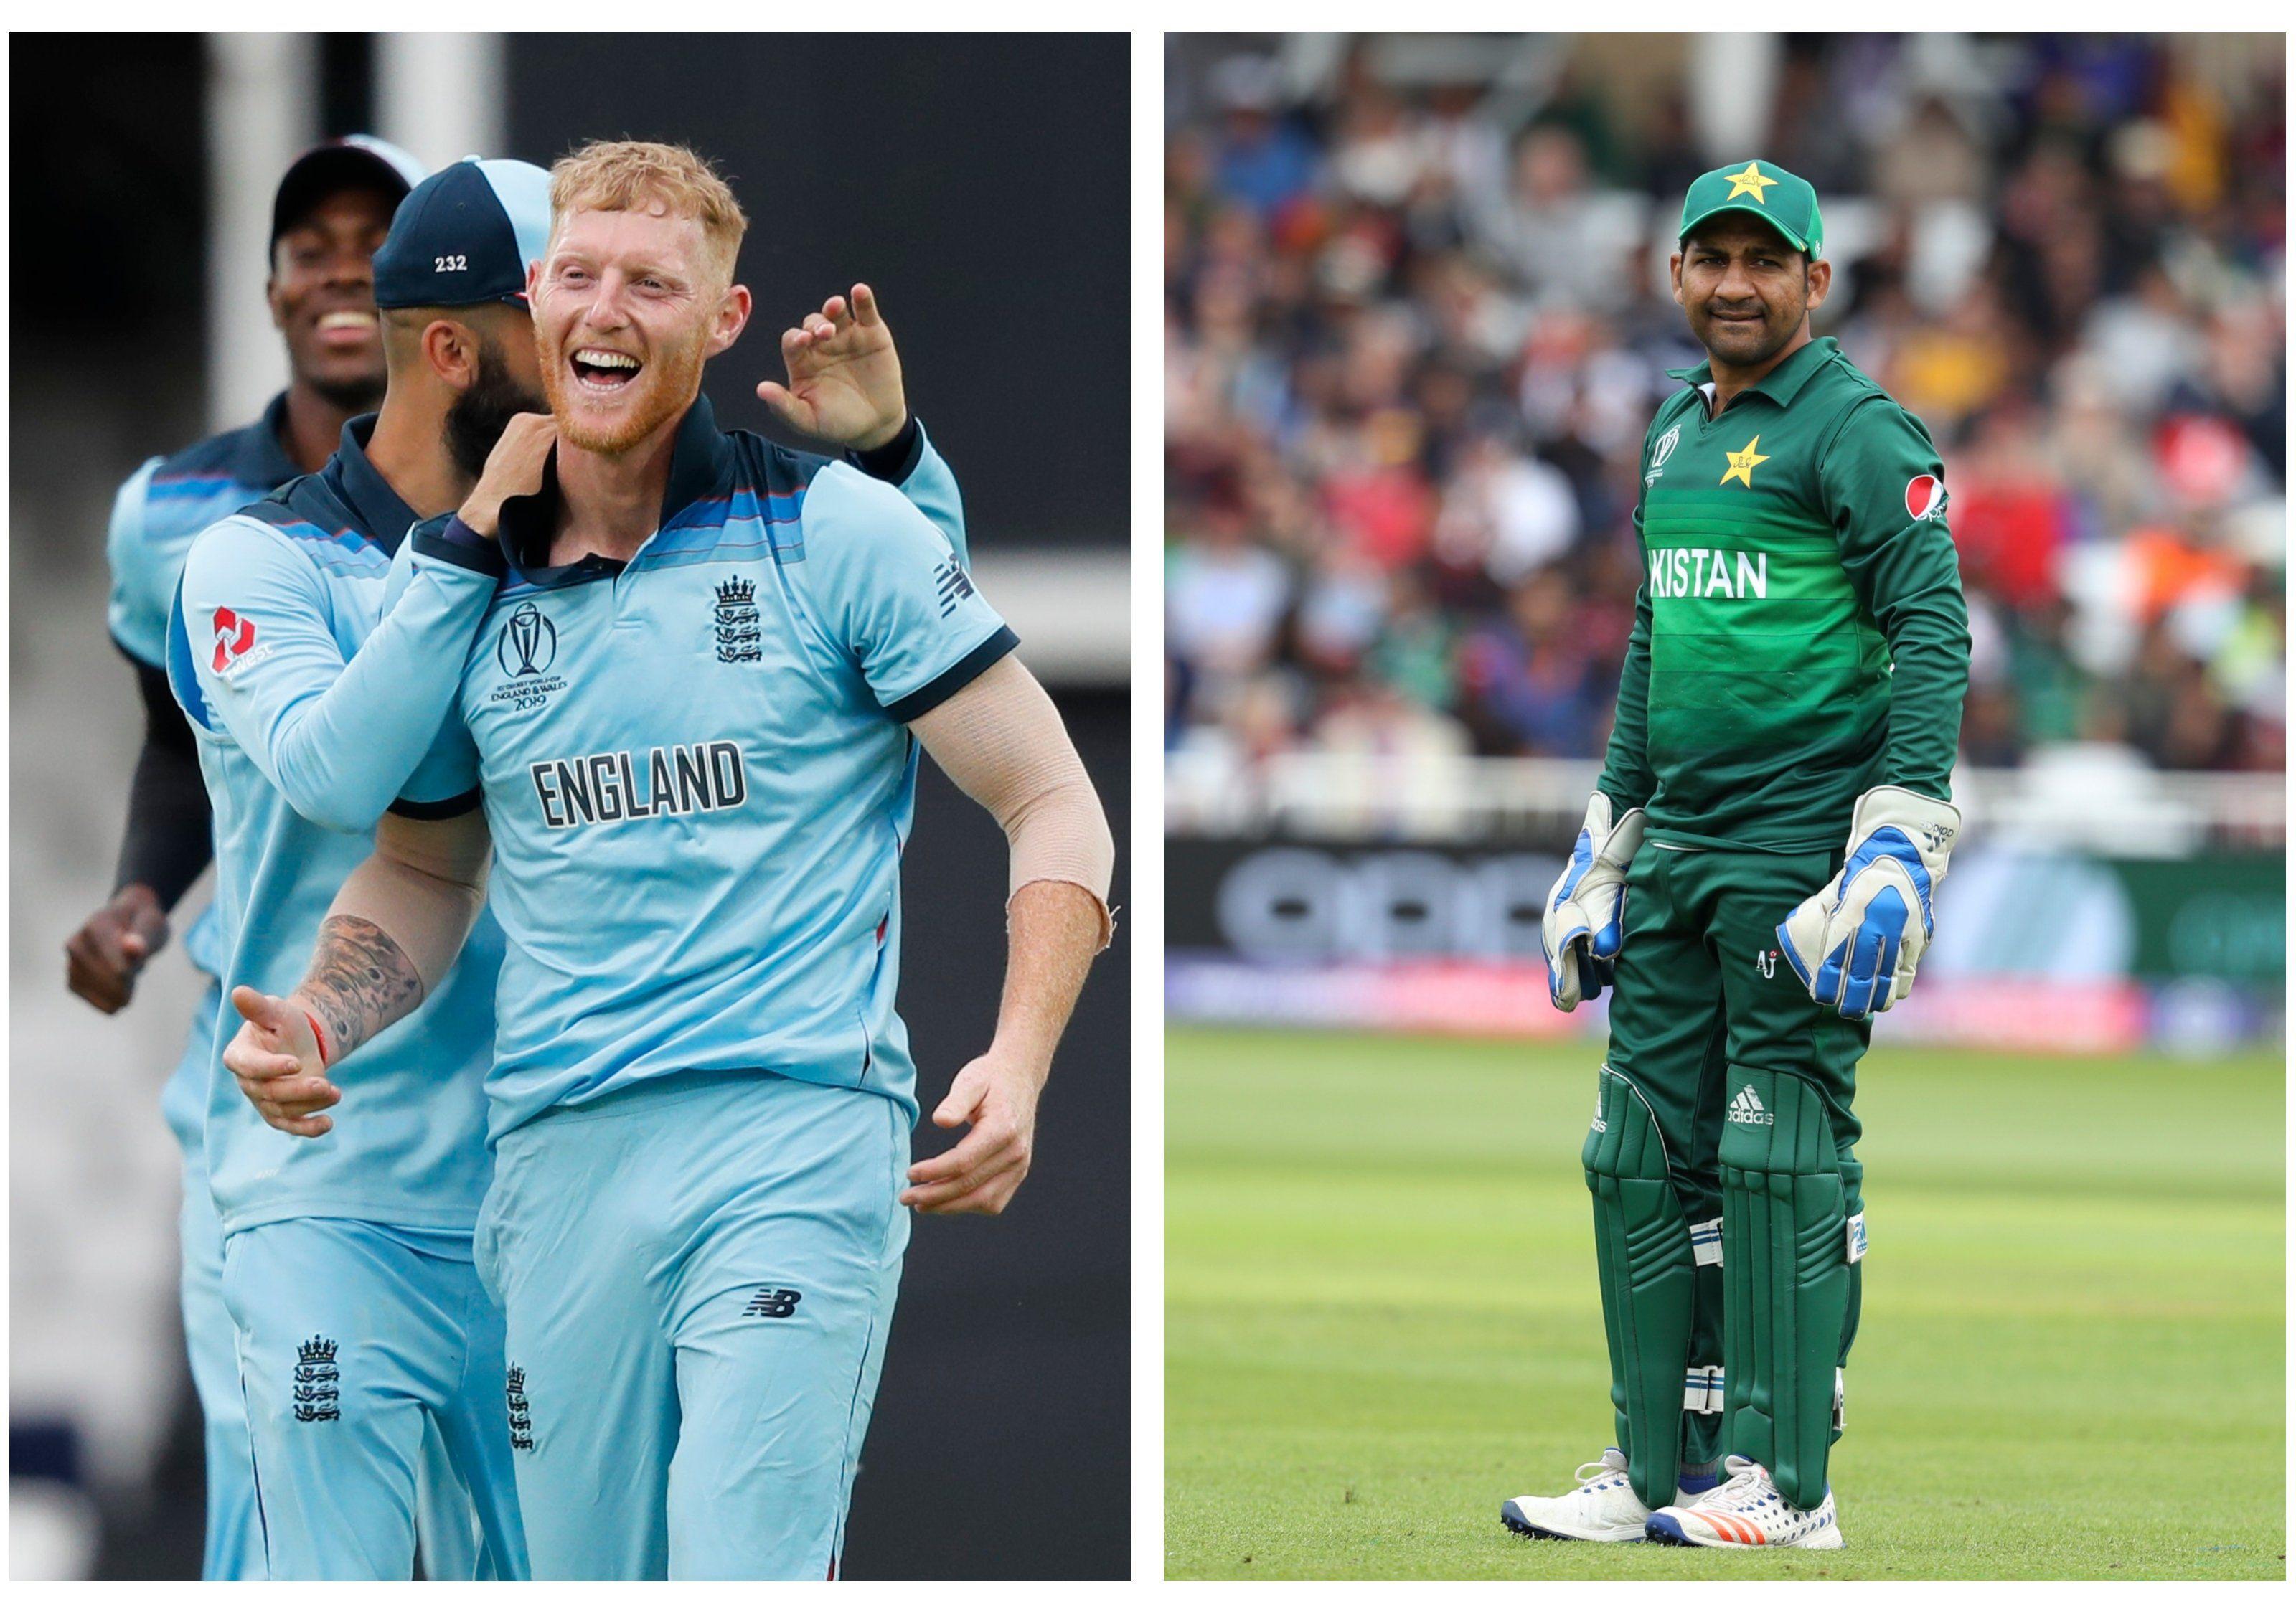 Cricket News England Vs Pakistan Live Score Stream And Match Time Cricket World Cup 2019 Cricket World Cup England Cricket Team World Cup